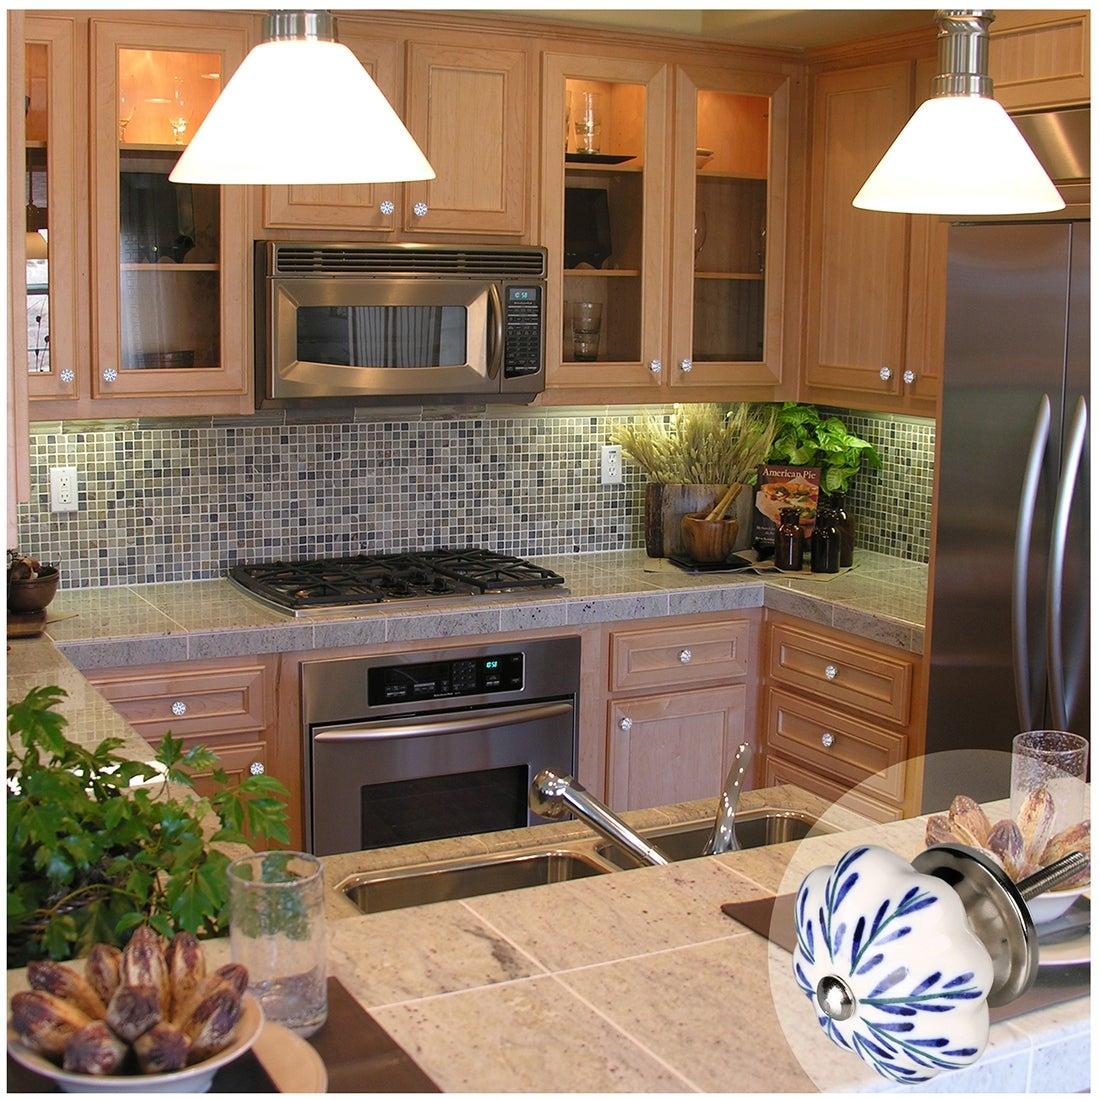 Brown Antique Set of 6 Pcs Handcrafted Glass Kitchen Cabinet Door Pulls Knobs